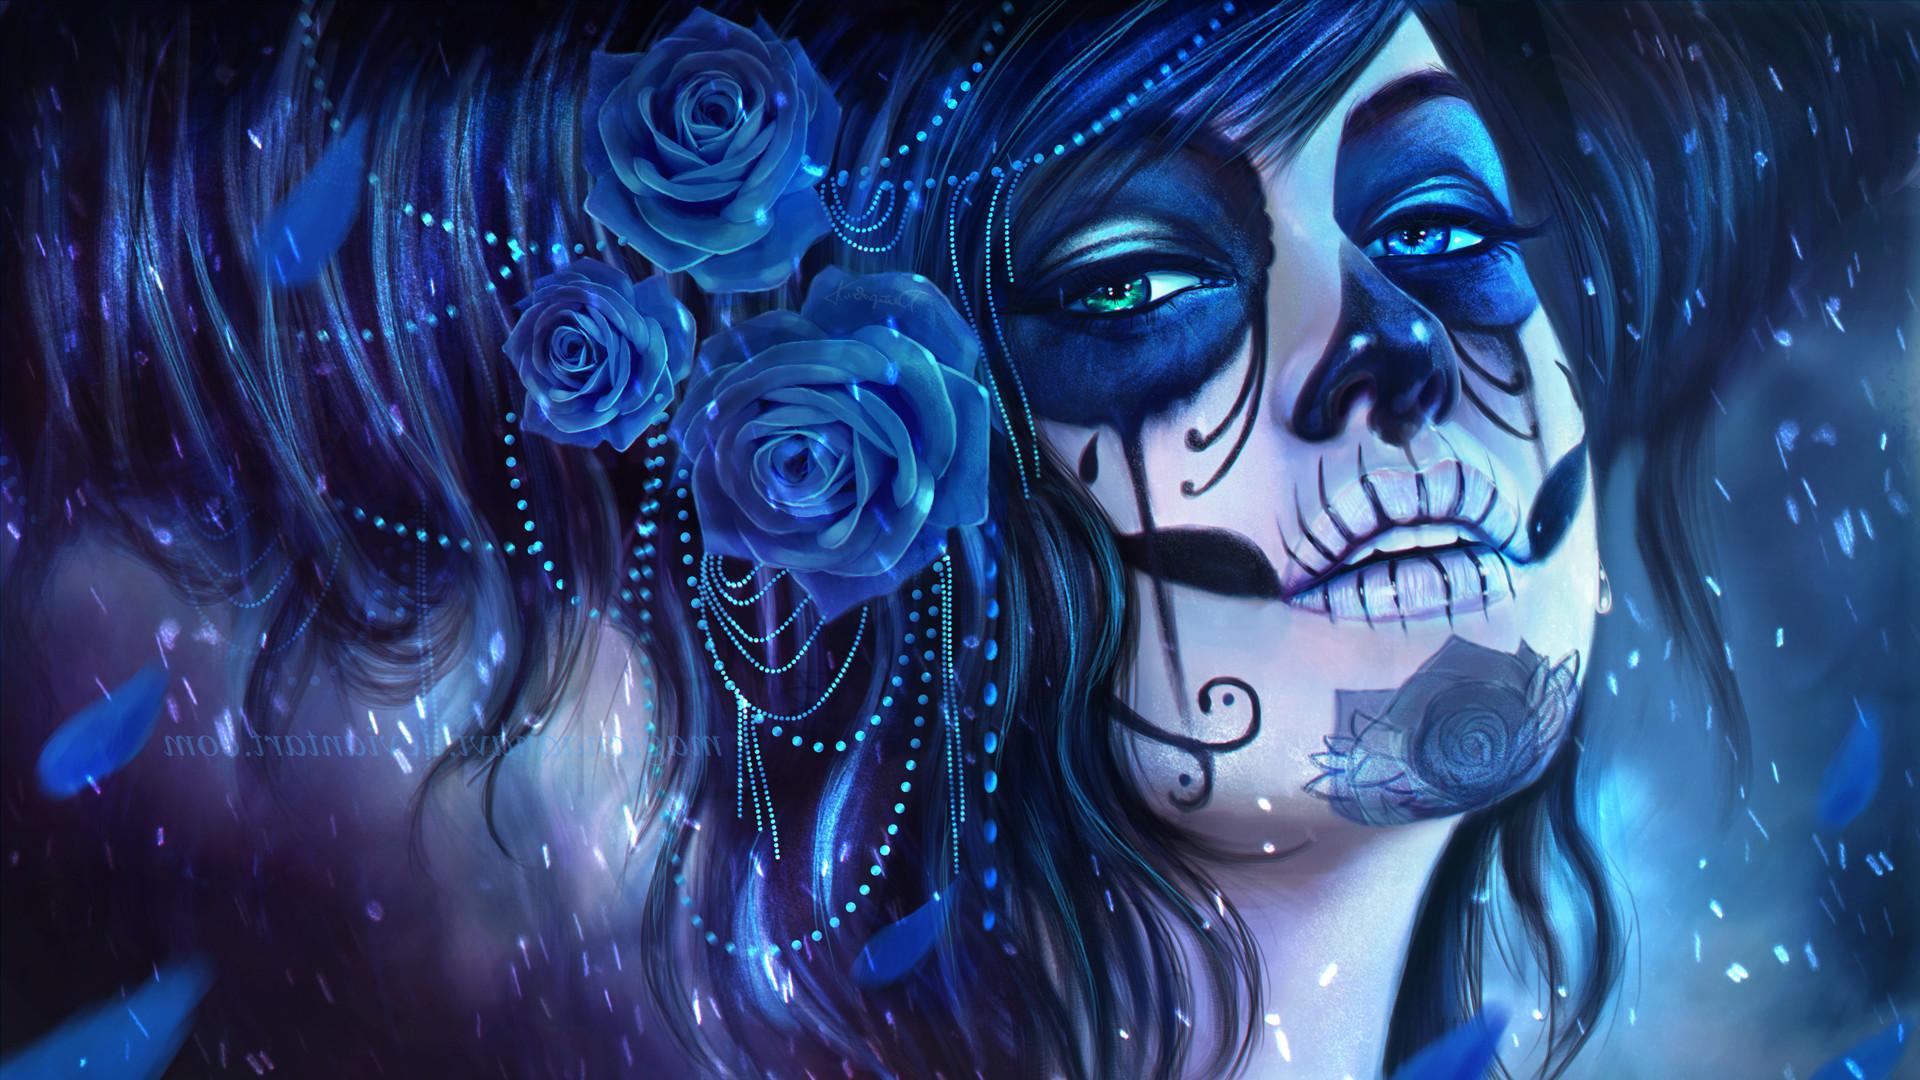 Res: 1920x1080, Sugar Skull, MagicnaAnavi, Rose, Artwork, Blue Flowers Wallpapers HD /  Desktop and Mobile Backgrounds